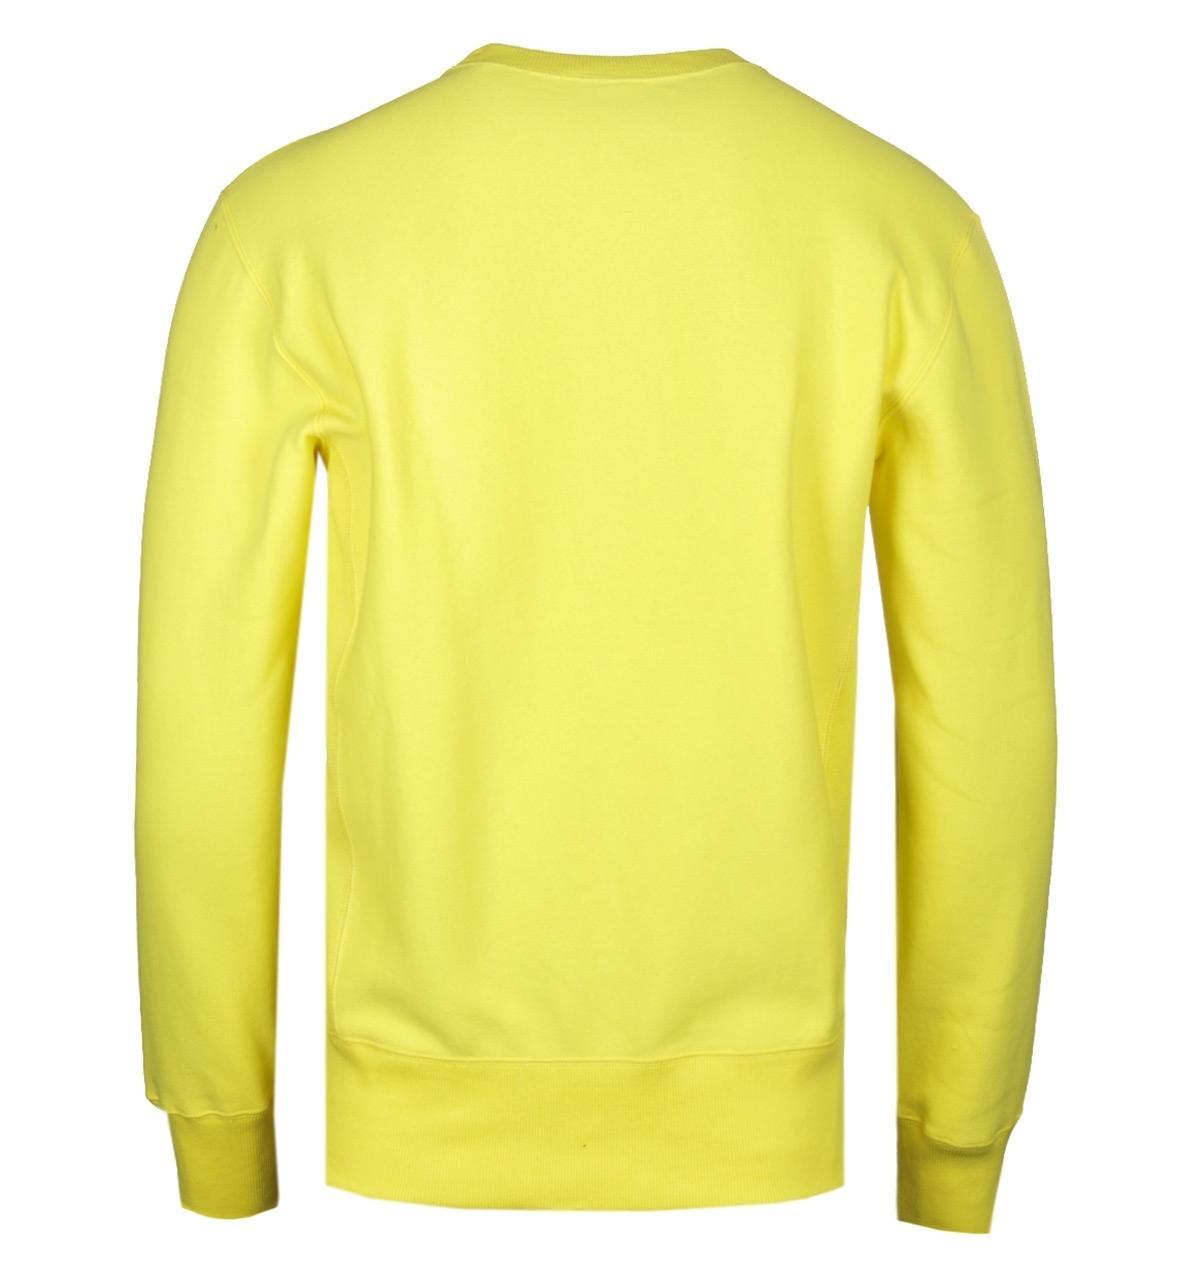 f013665cd9a1 Champion - Reverse Weave Yellow Sweatshirt for Men - Lyst. View fullscreen